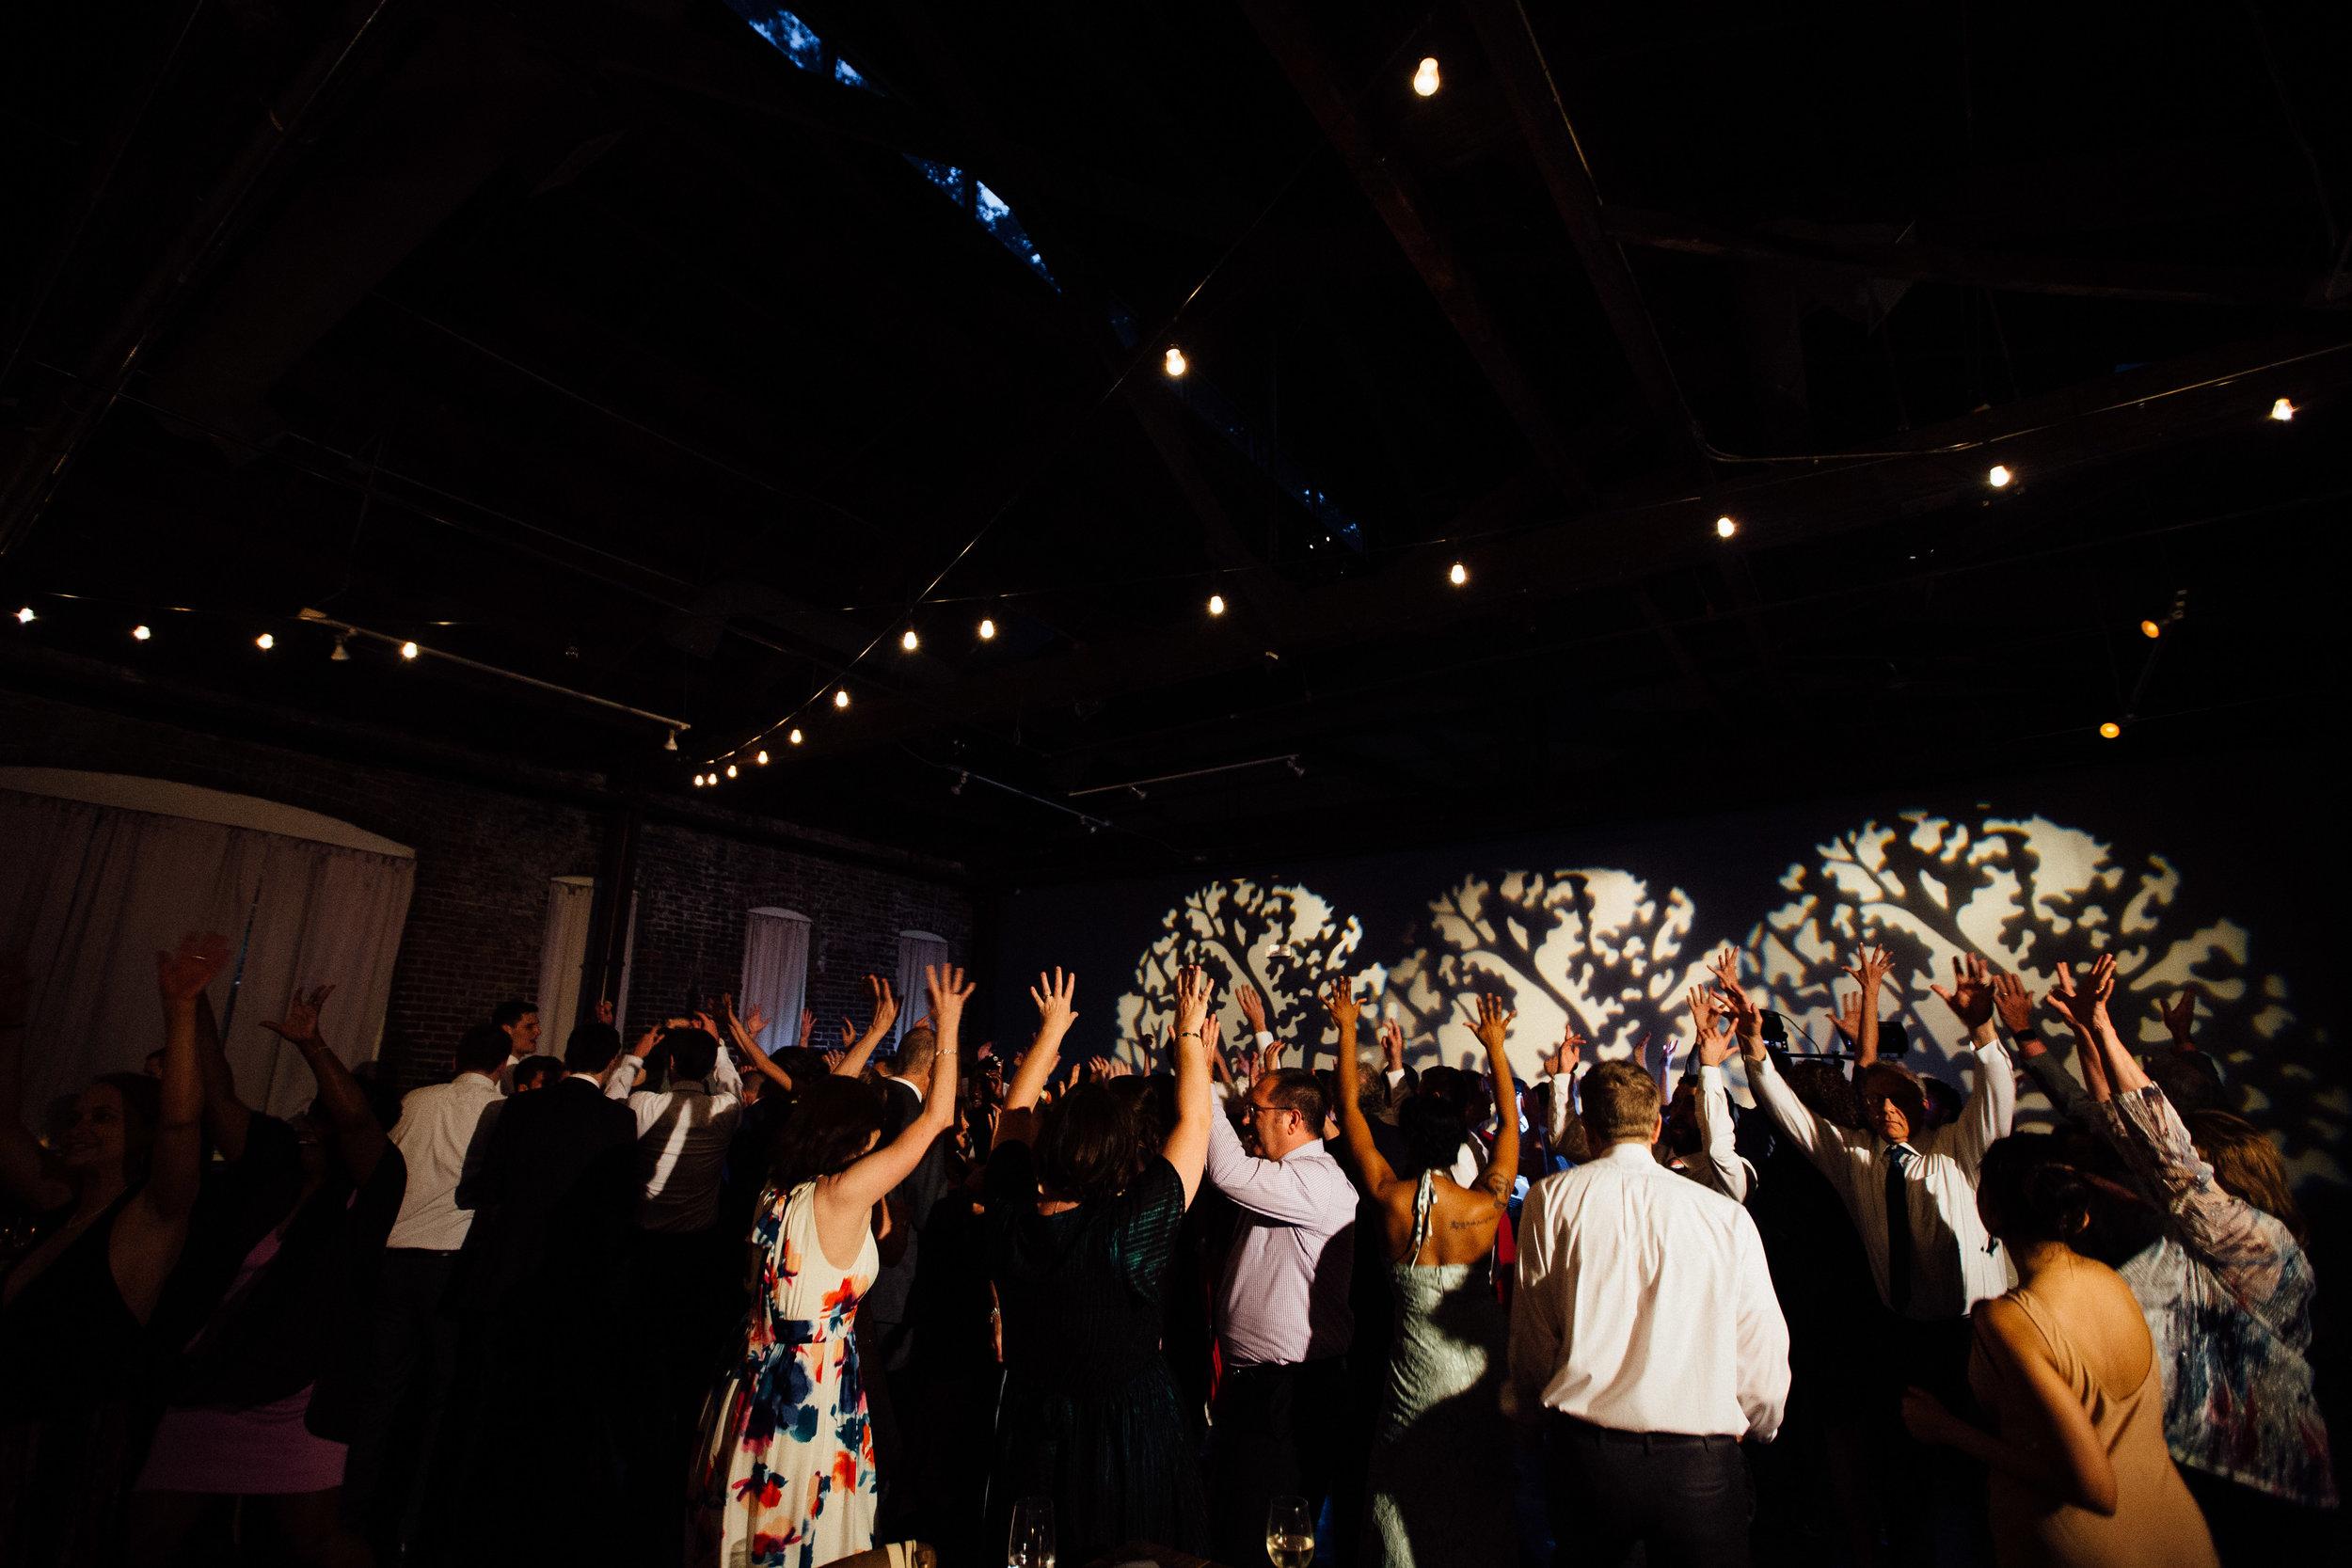 king_plow_atlanta_wedding_art_gallery_modern_lifestyle_documentary_1945.jpg